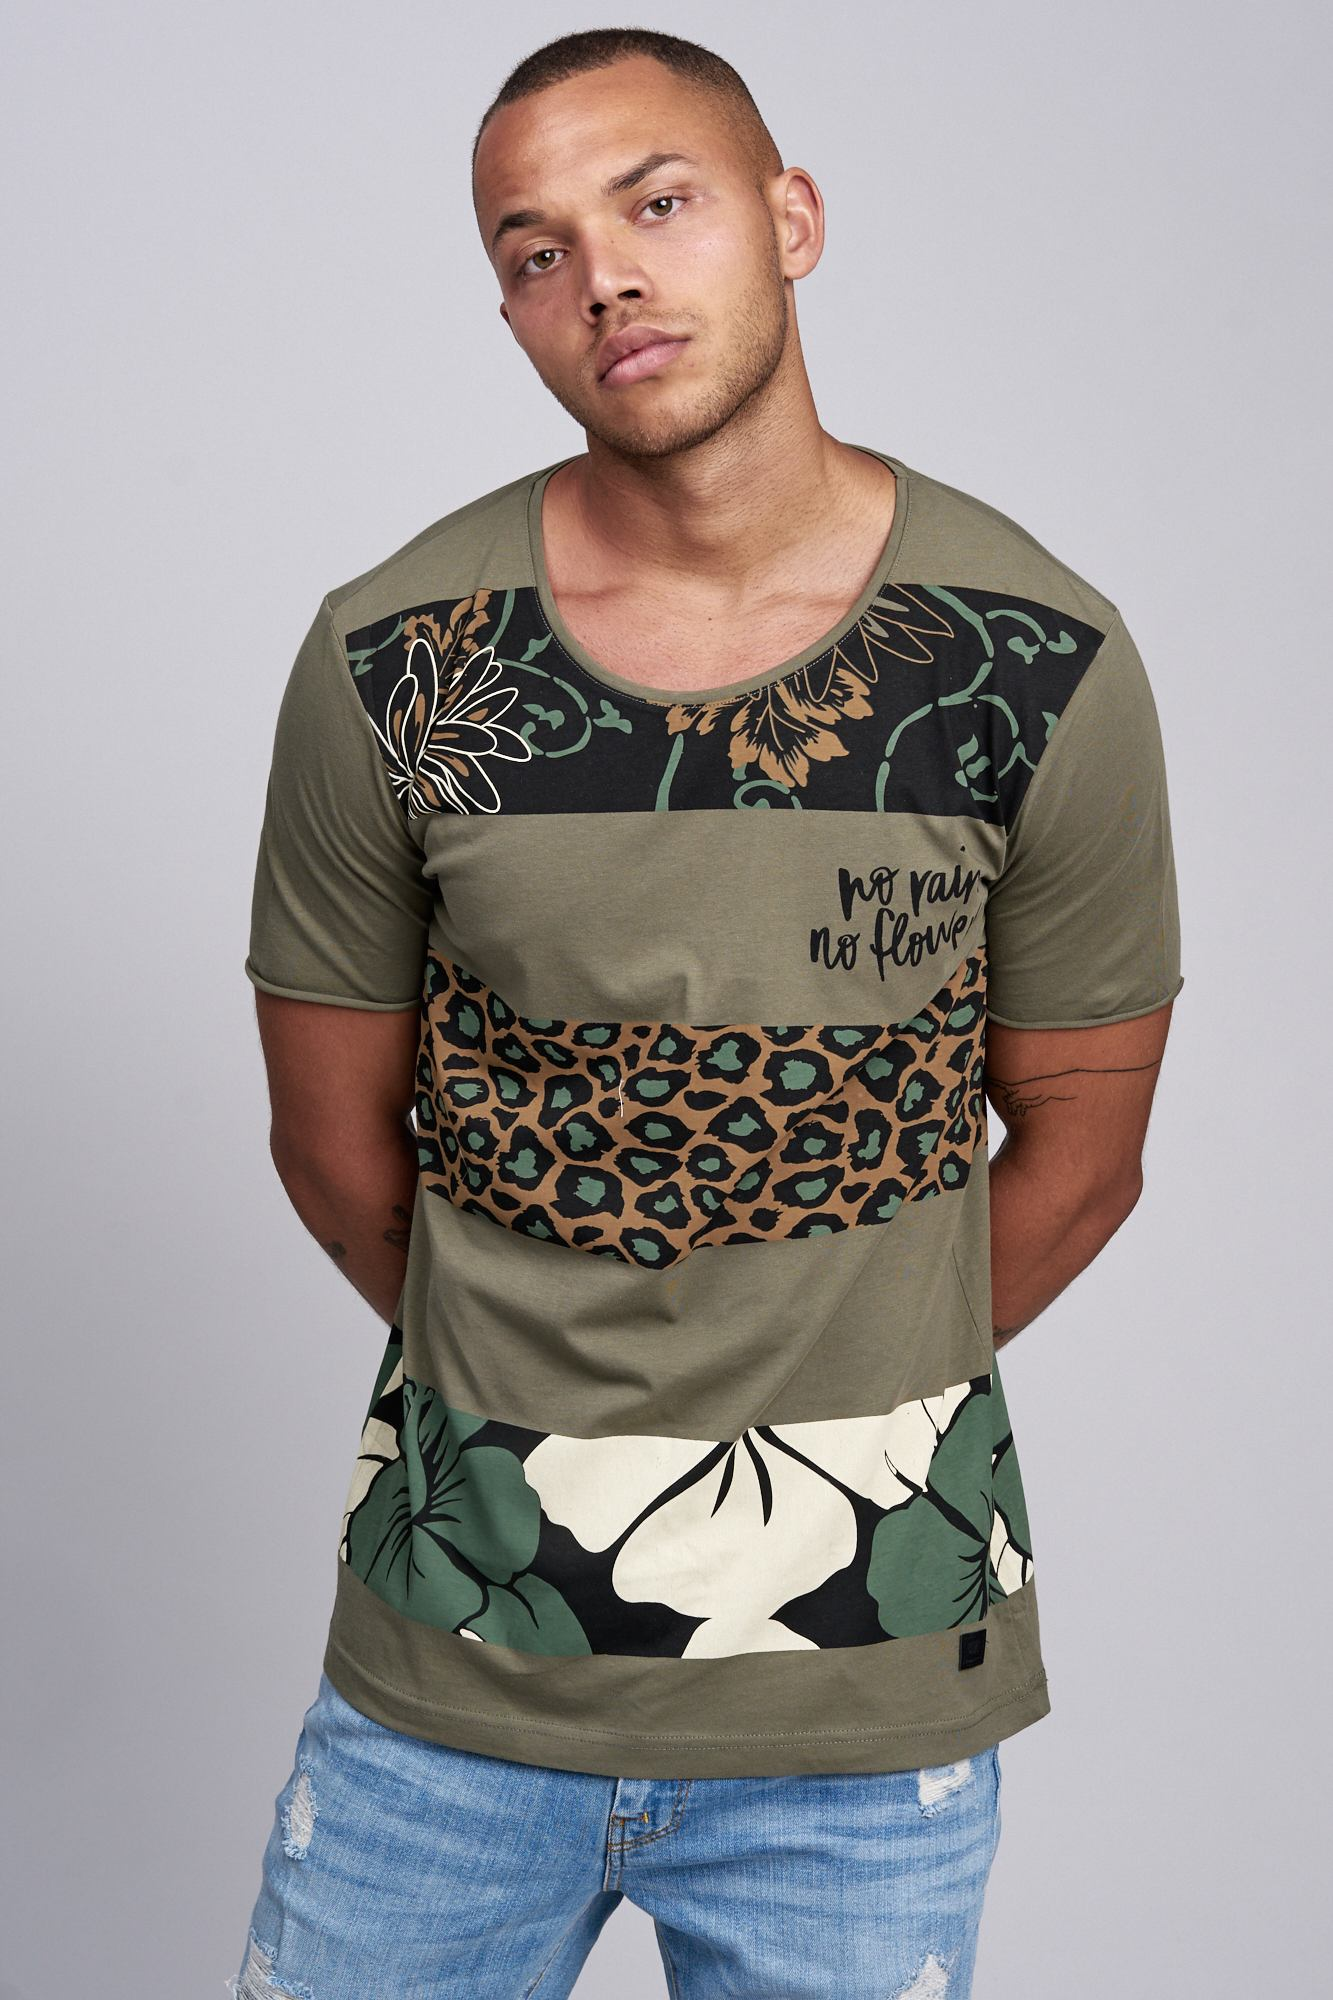 T-shirt-da-Uomo-Polo-Shirt-a-Maniche-Corte-printshirt-Polo-a-Maniche-Corte-17019-John-Kayna miniatura 9